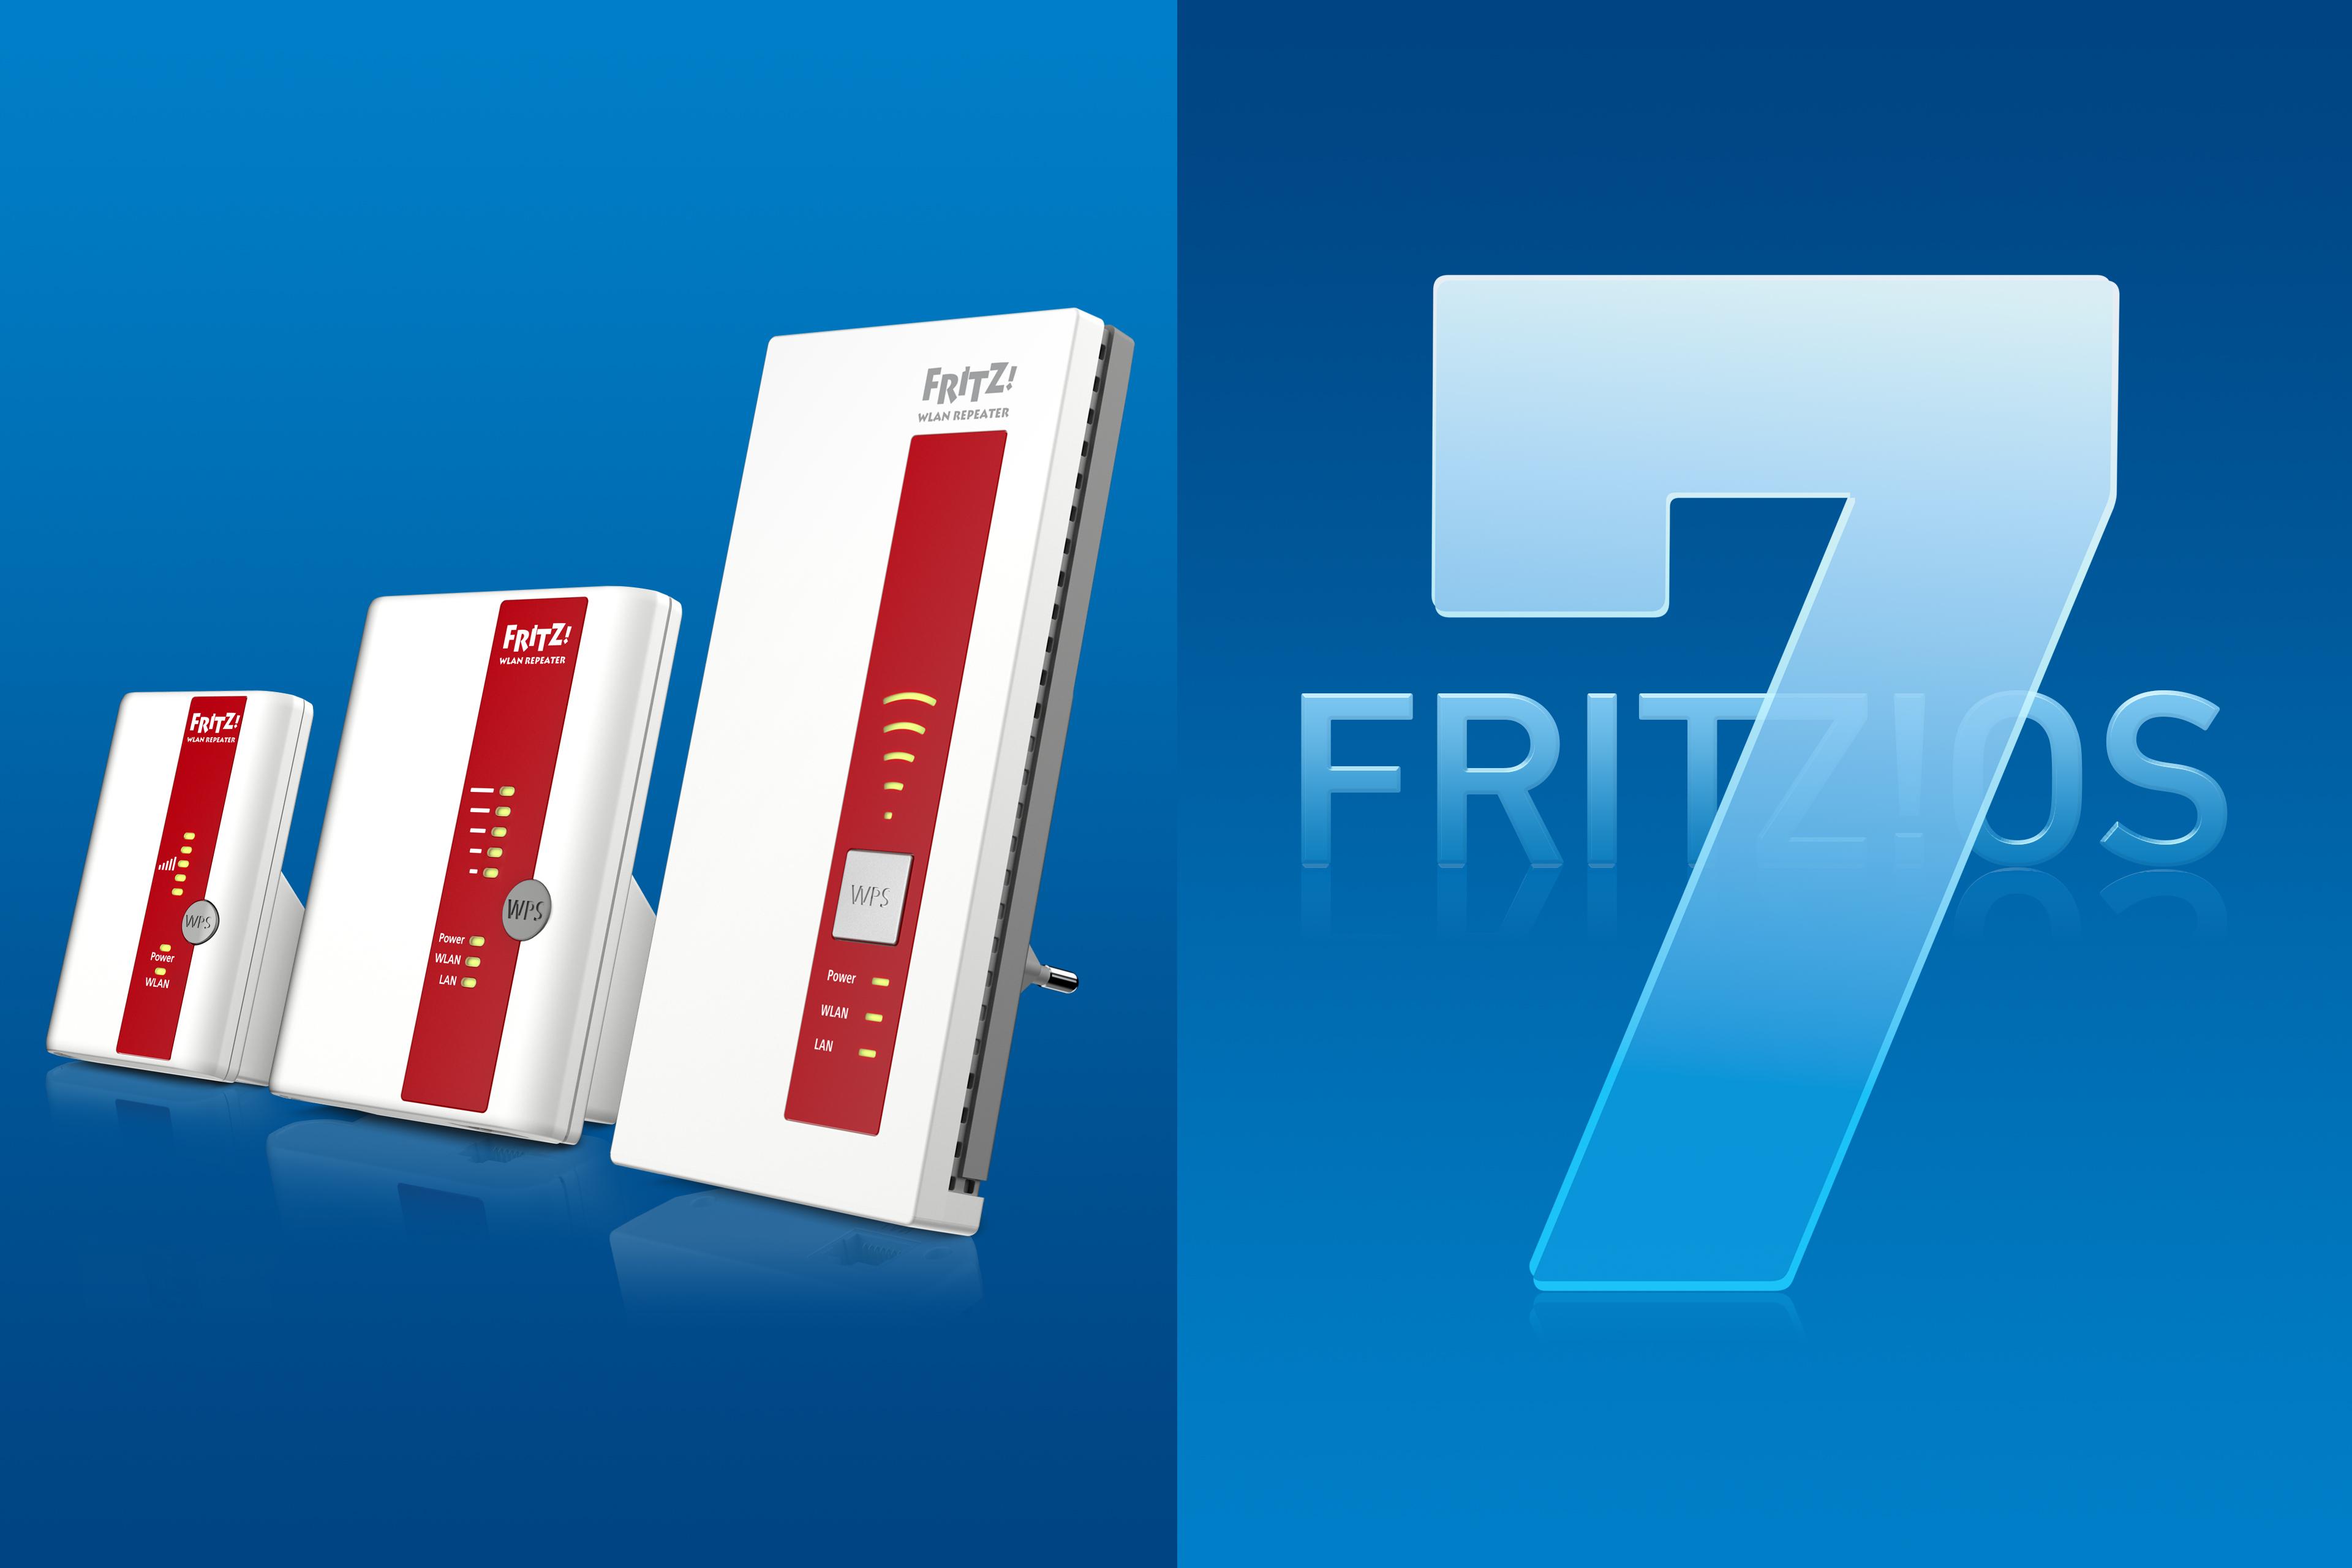 Fritz Os 7.12